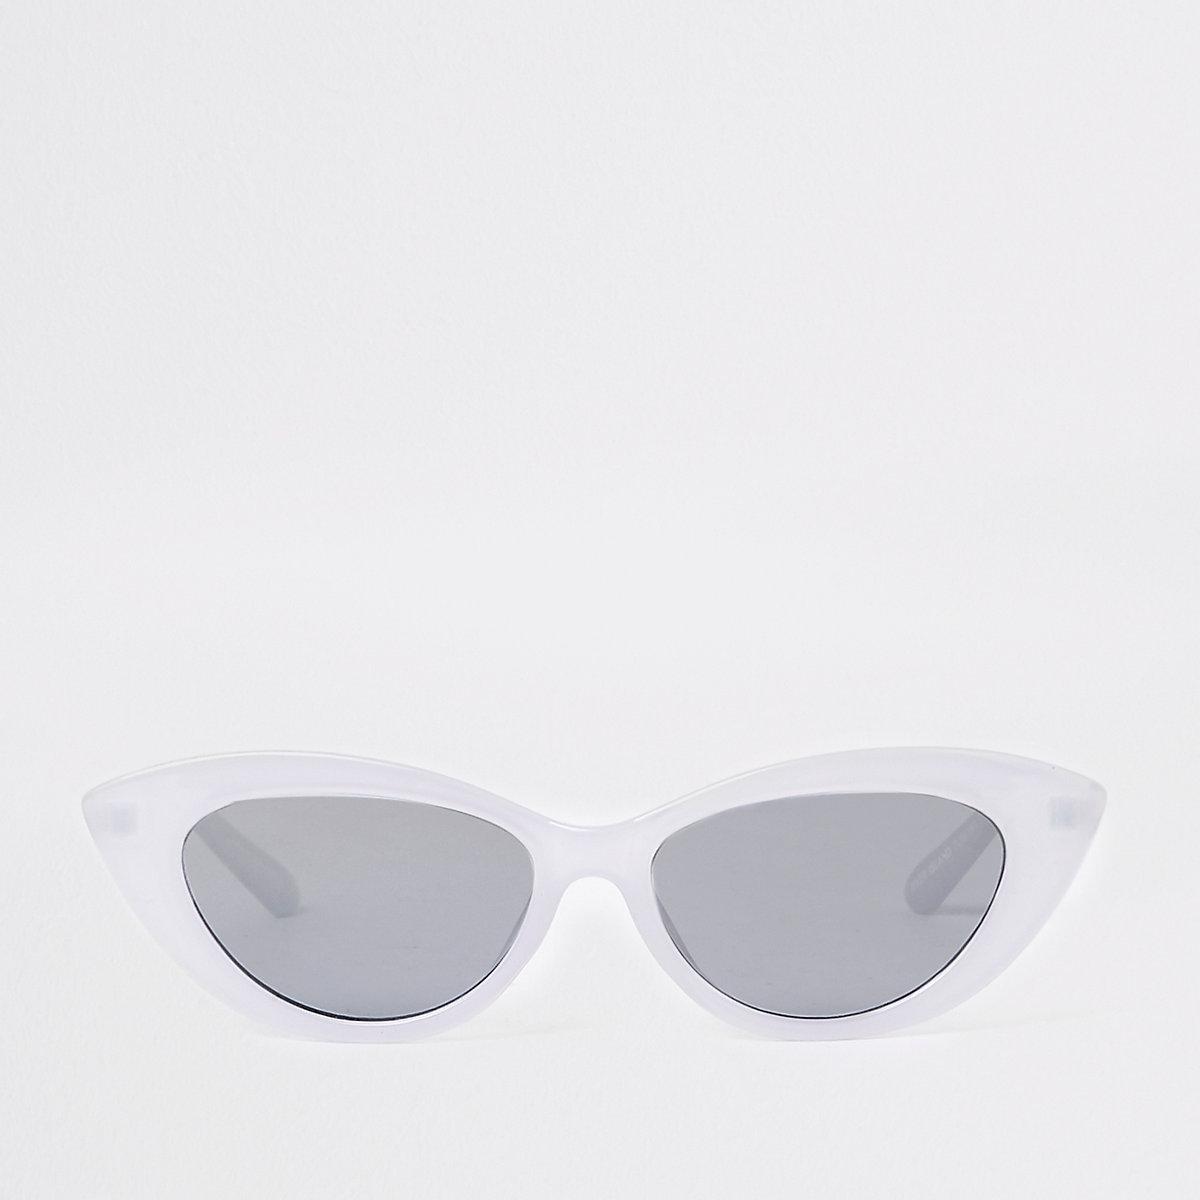 Light purple slim cat eye sunglasses